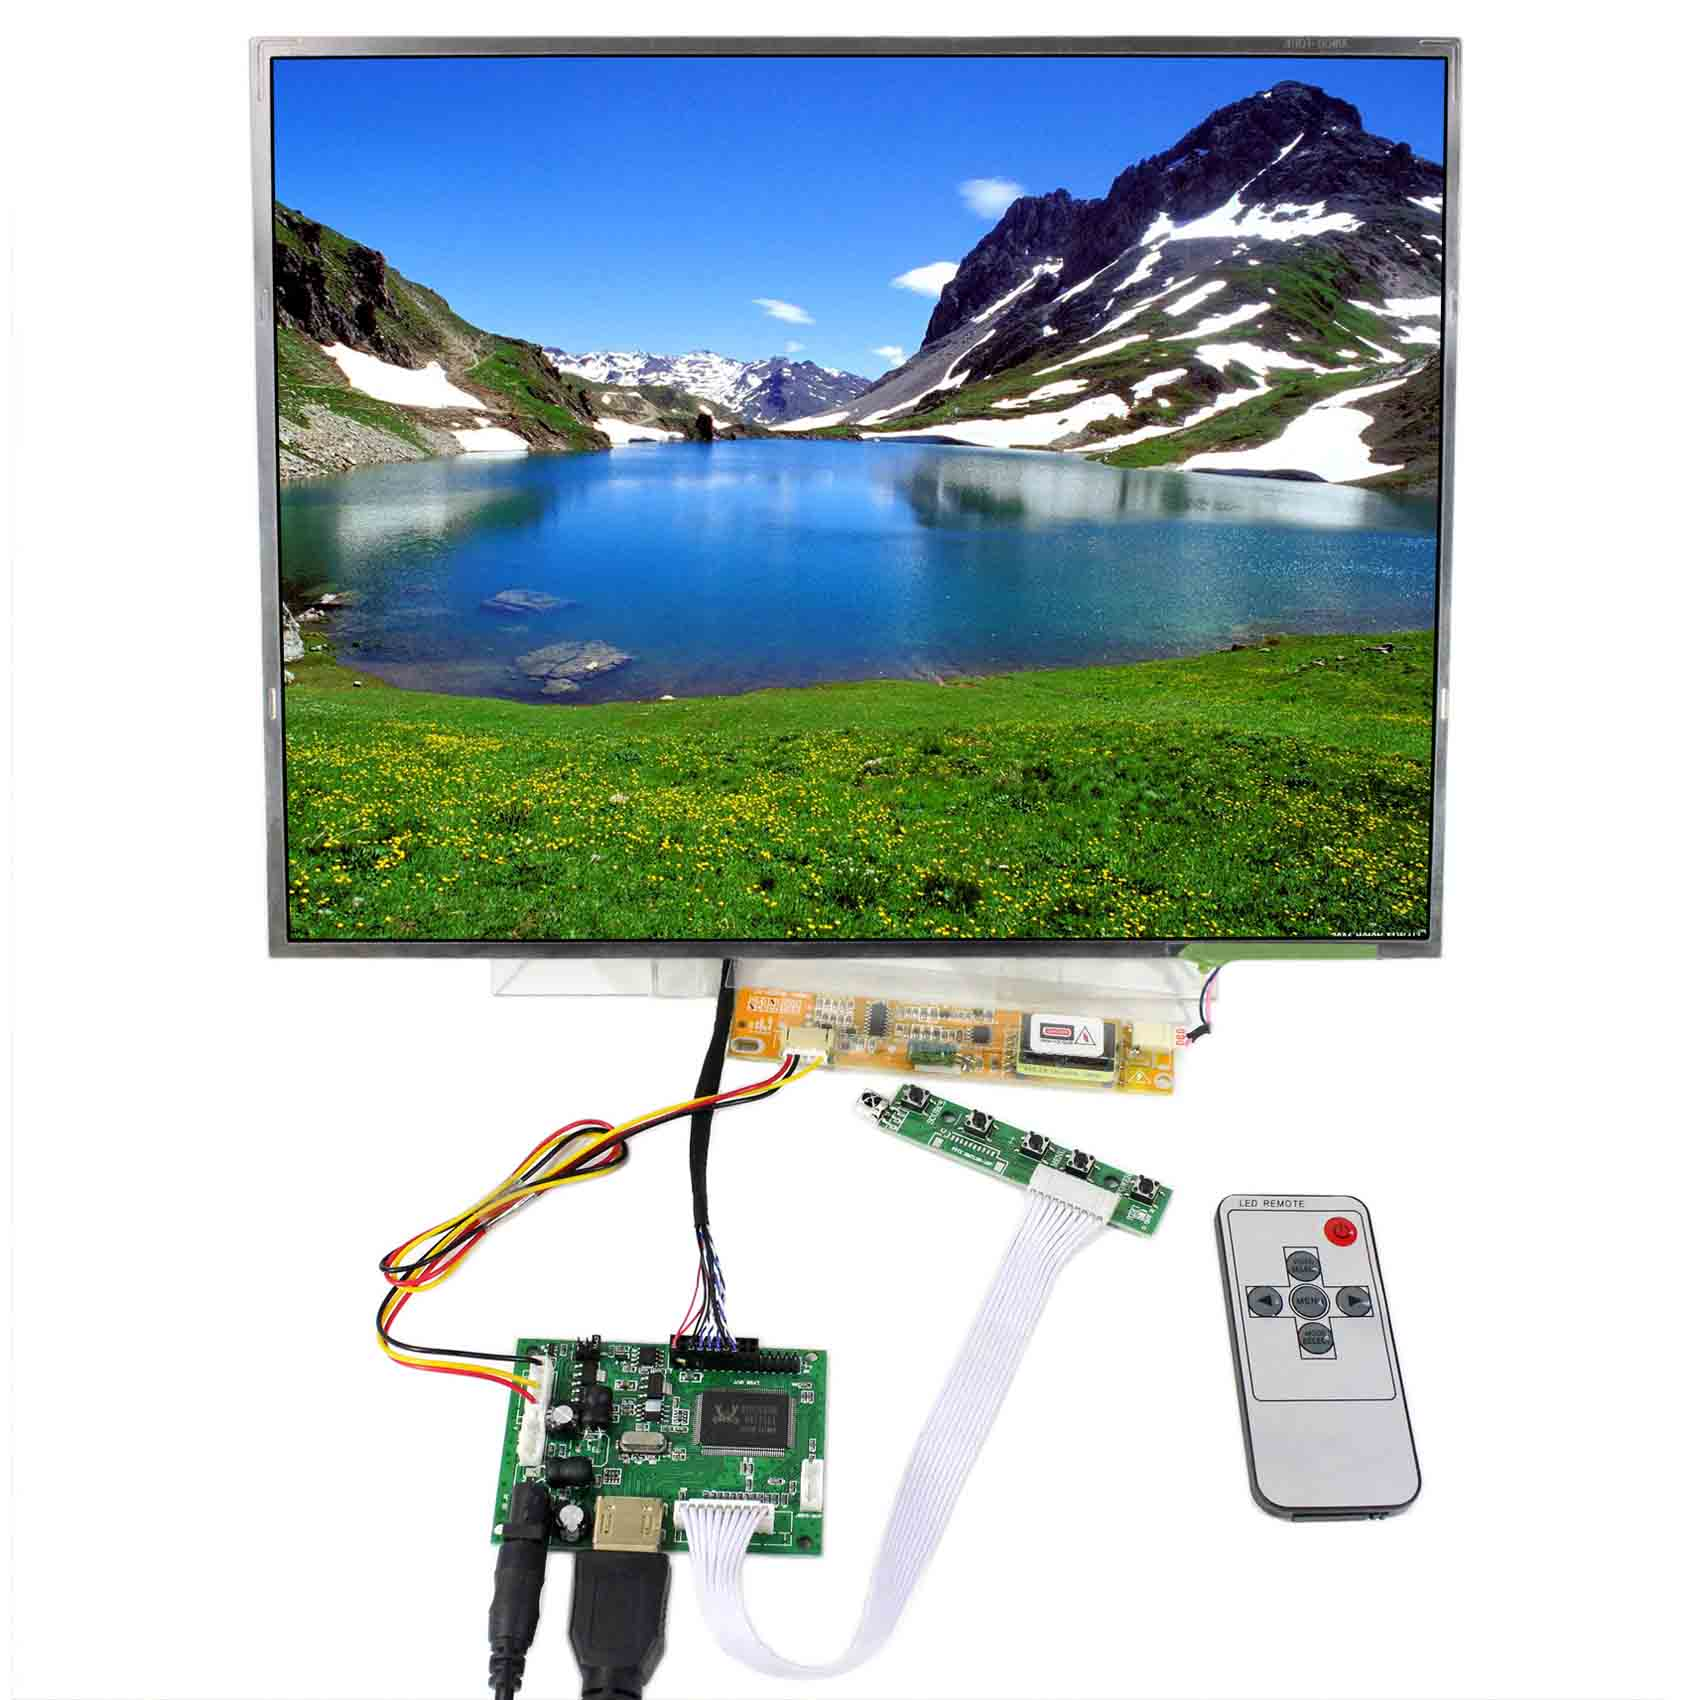 HDMI VGA AV USB LCD Controller Board 15 in LQ150X1LW94 1024X768 LCD Screen